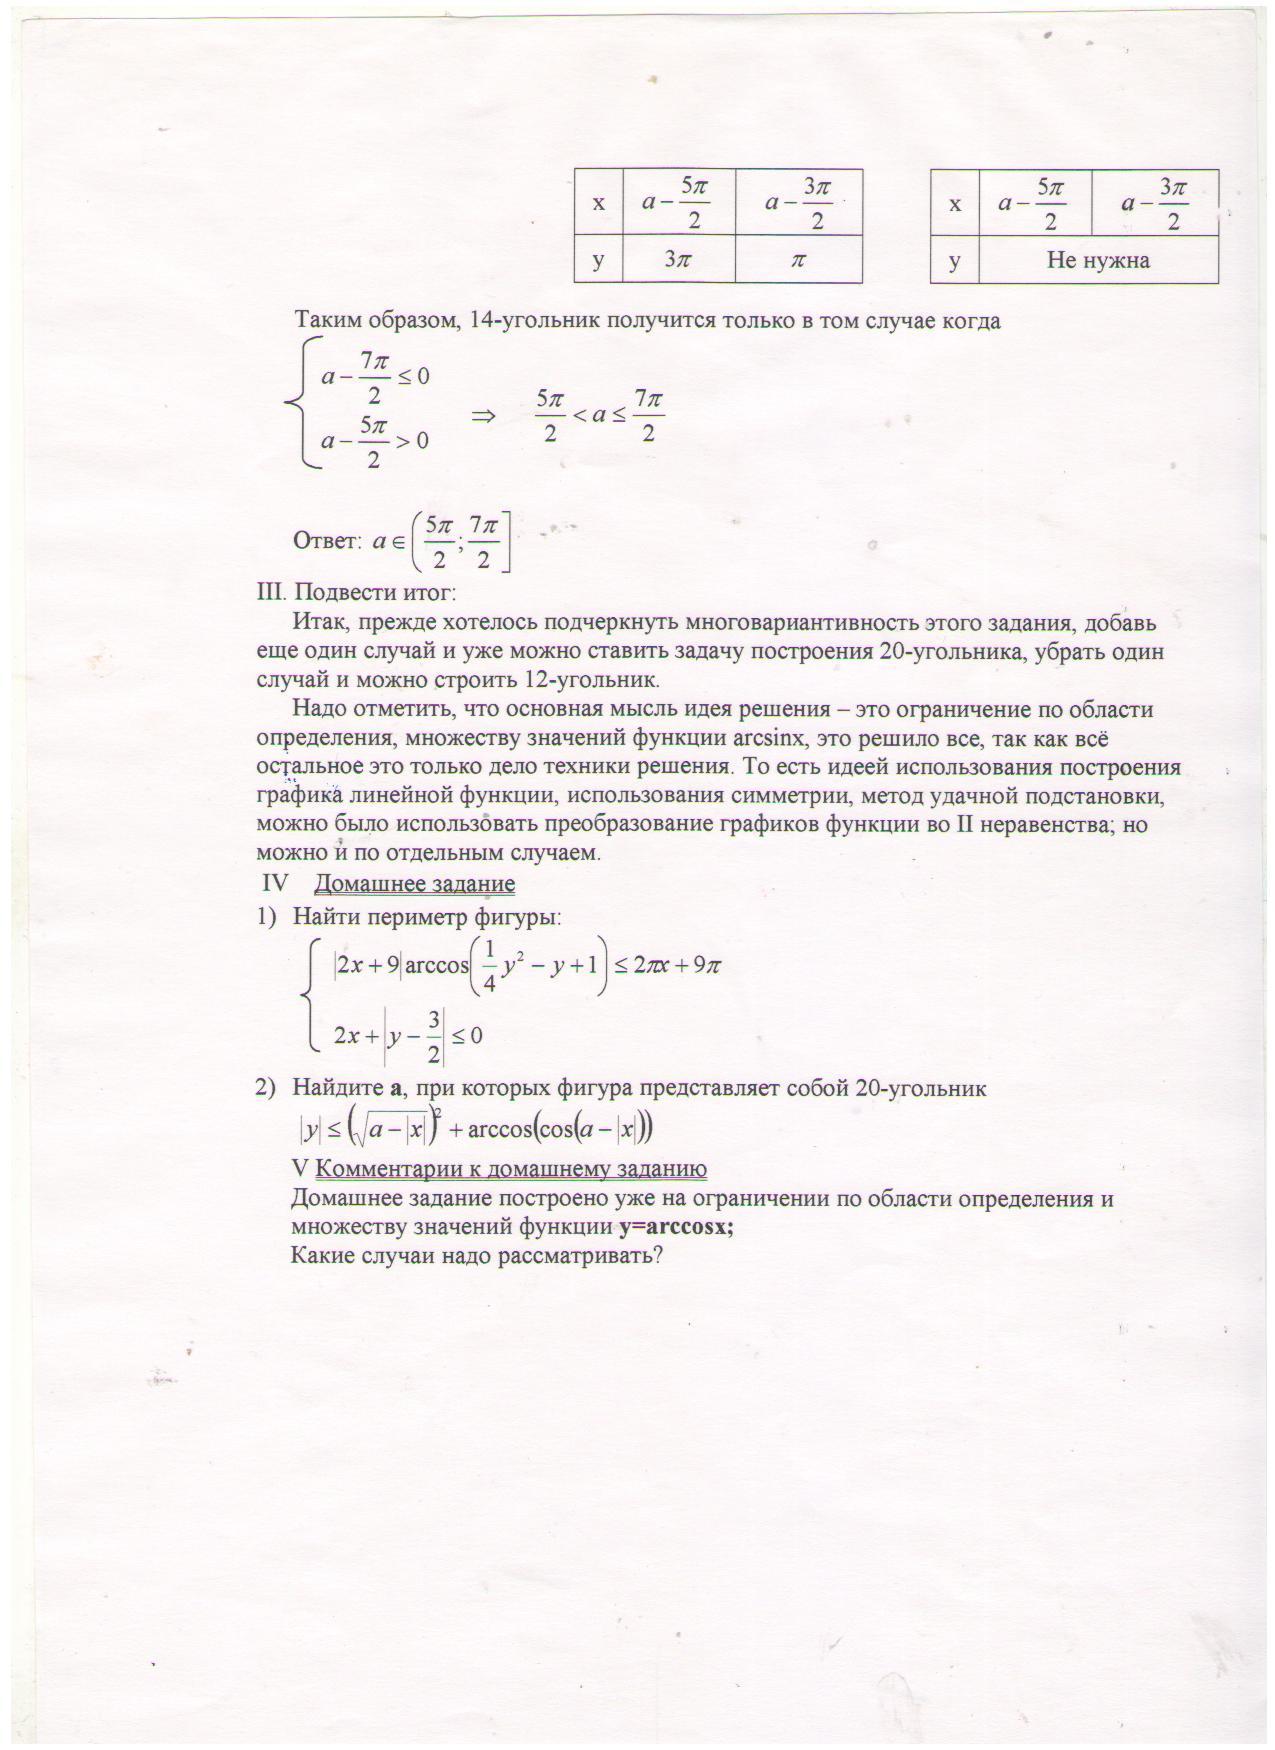 C:\Documents and Settings\23\Рабочий стол\урок\первый\4.jpg